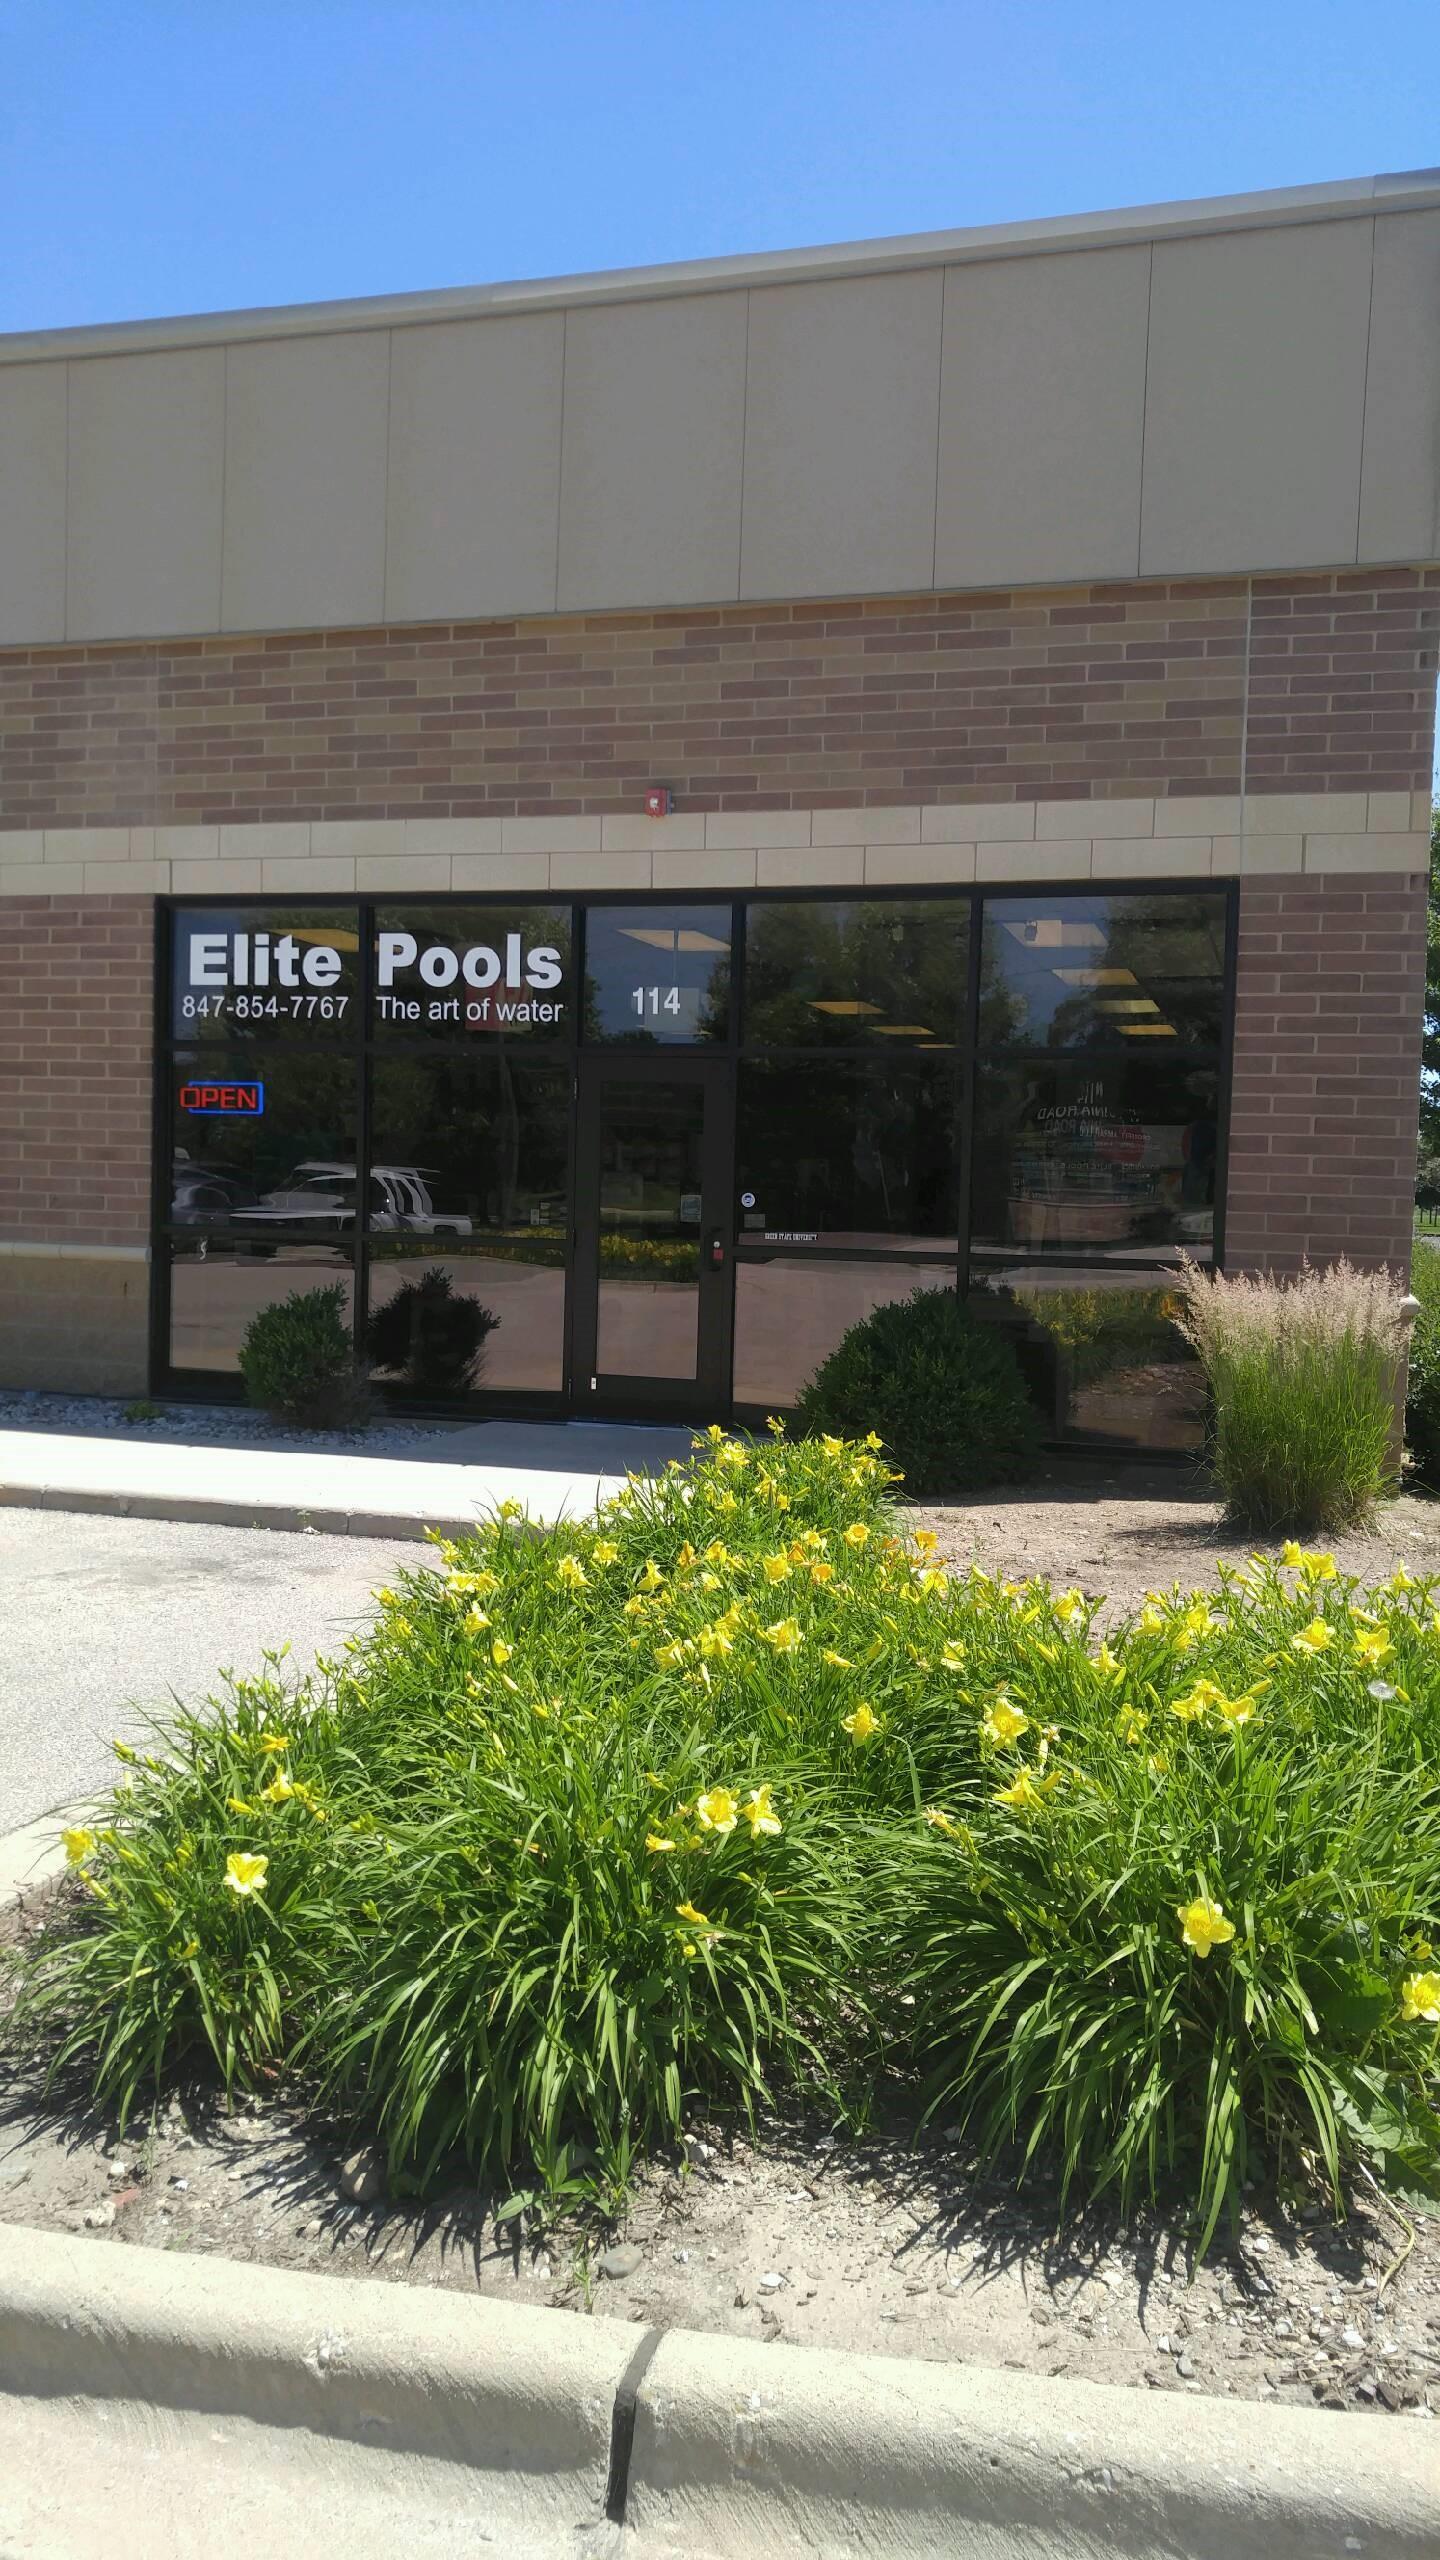 Elite Pools and Spas image 1